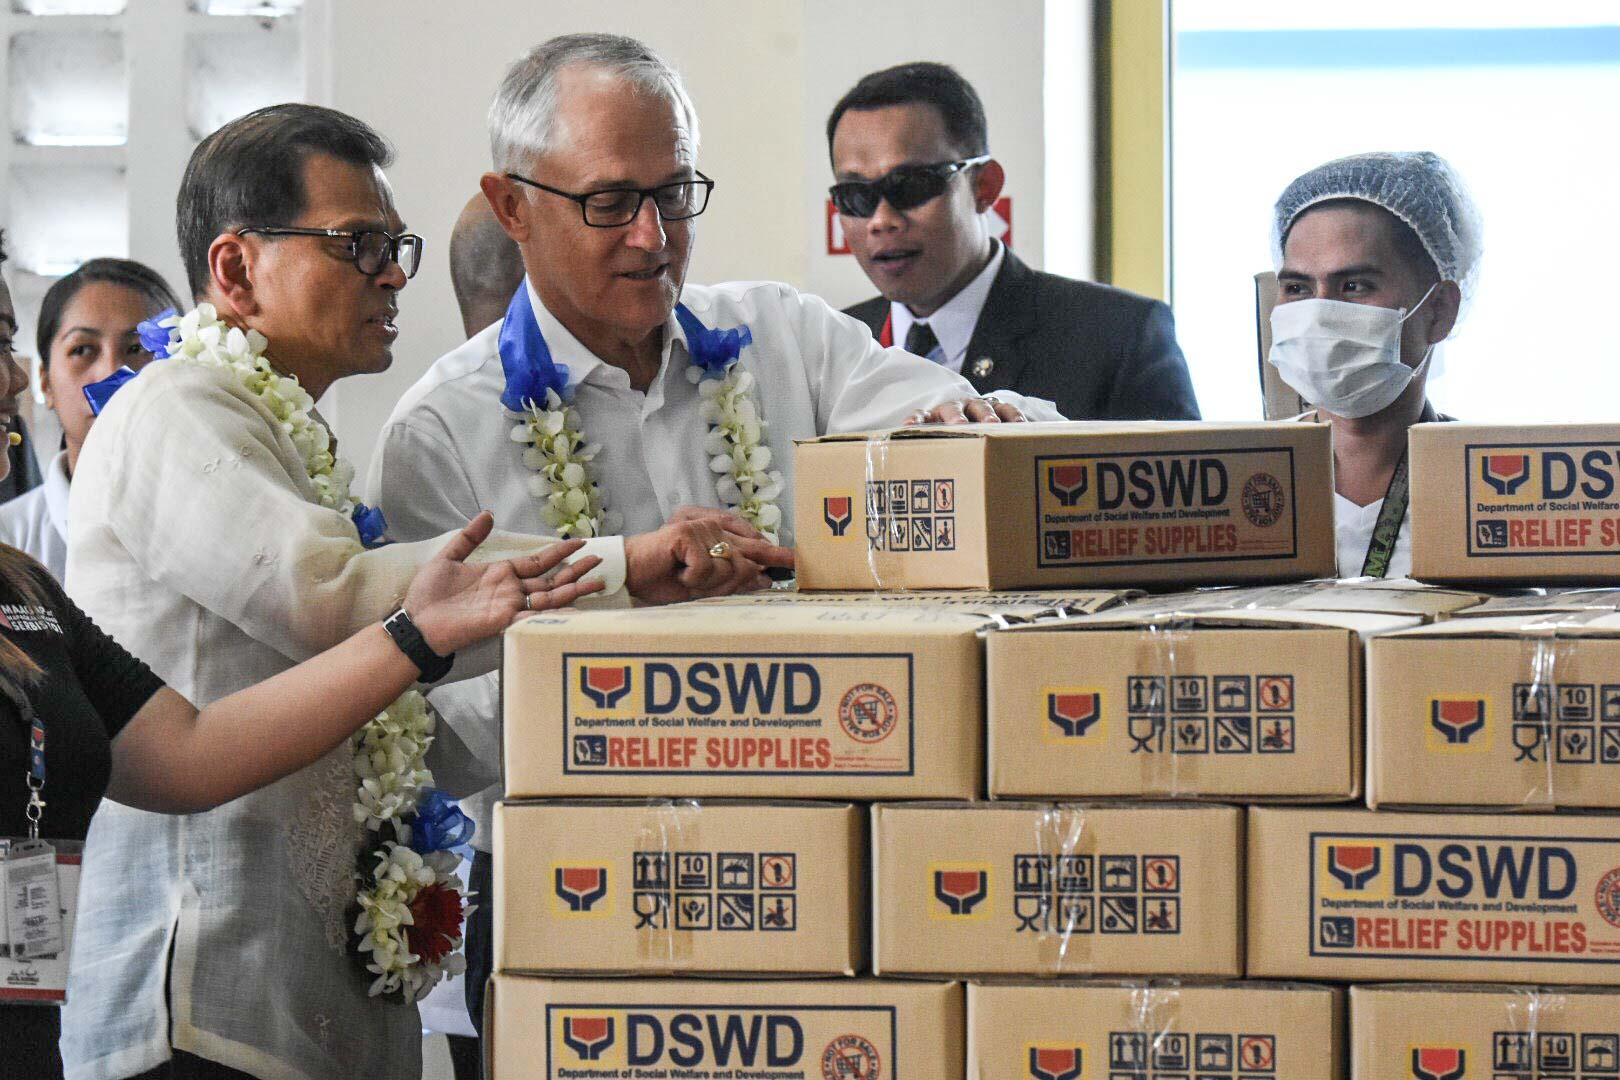 Turnbull talks security, terrorism, Marawi crisis during PH visit